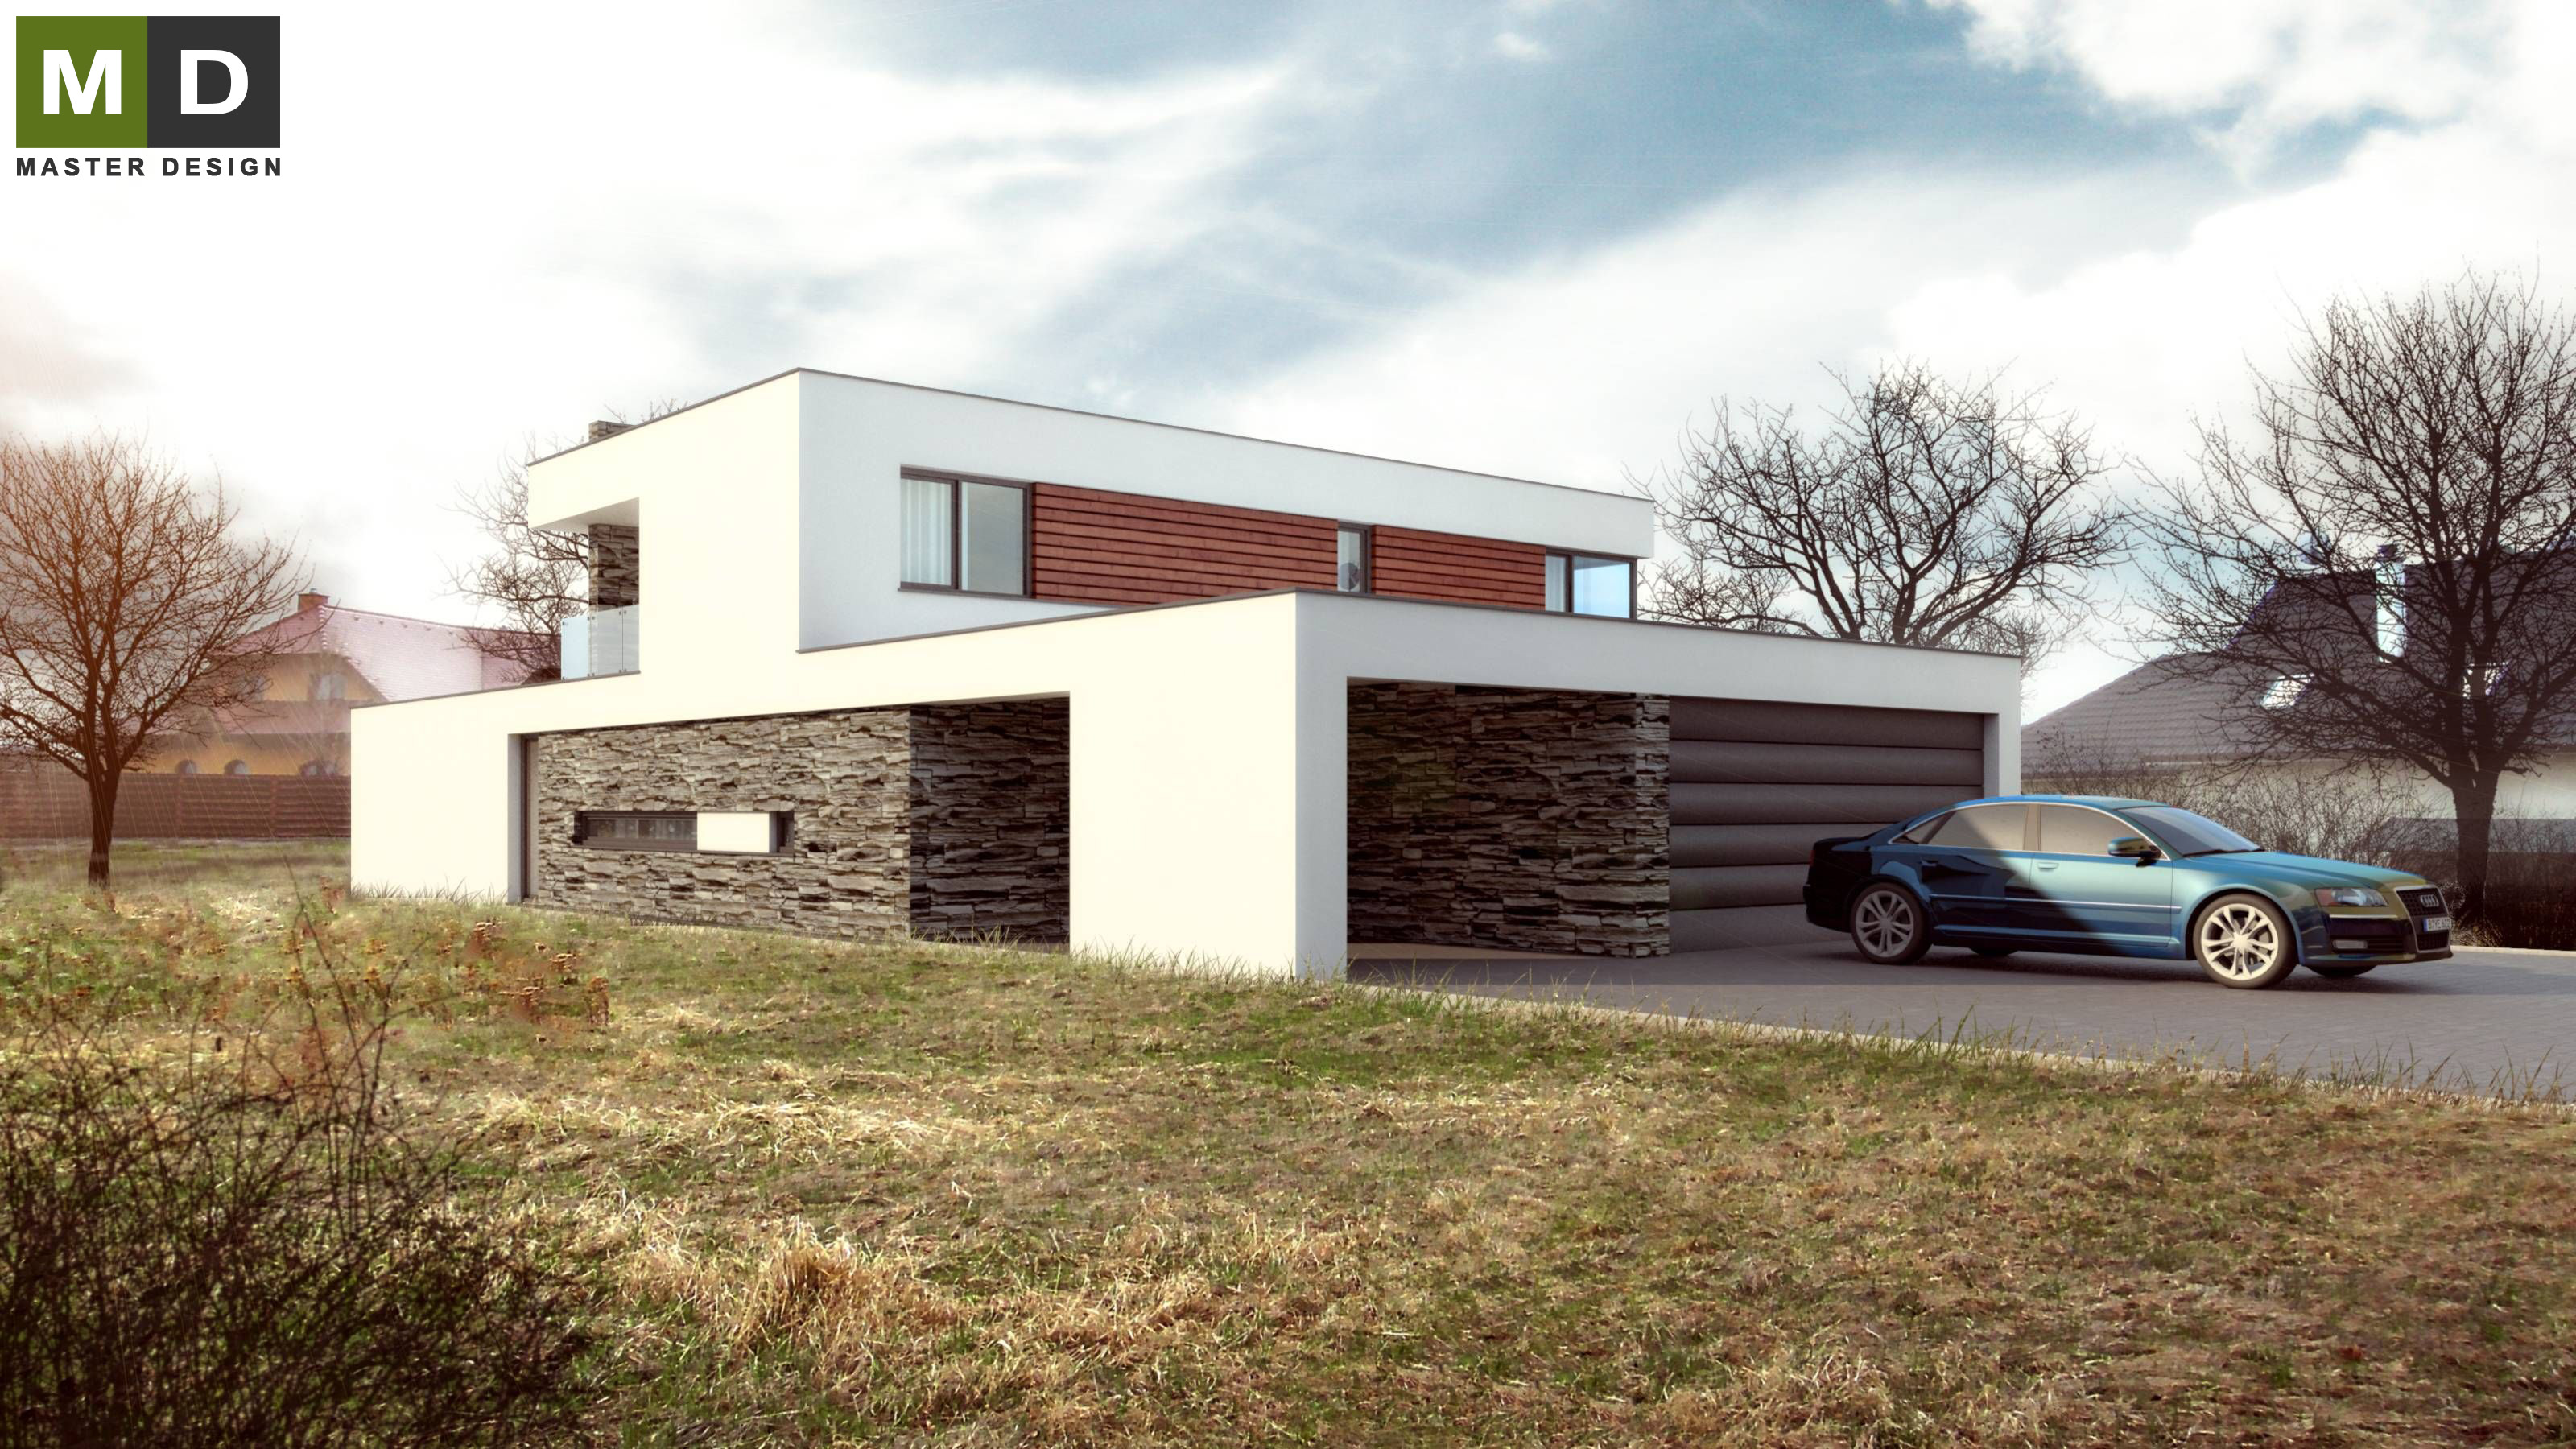 Delightful Home Design Zlín Part - 3: Luxury Low Energy House With A Flat Roof - Zlín - Vizualizace 2 ...